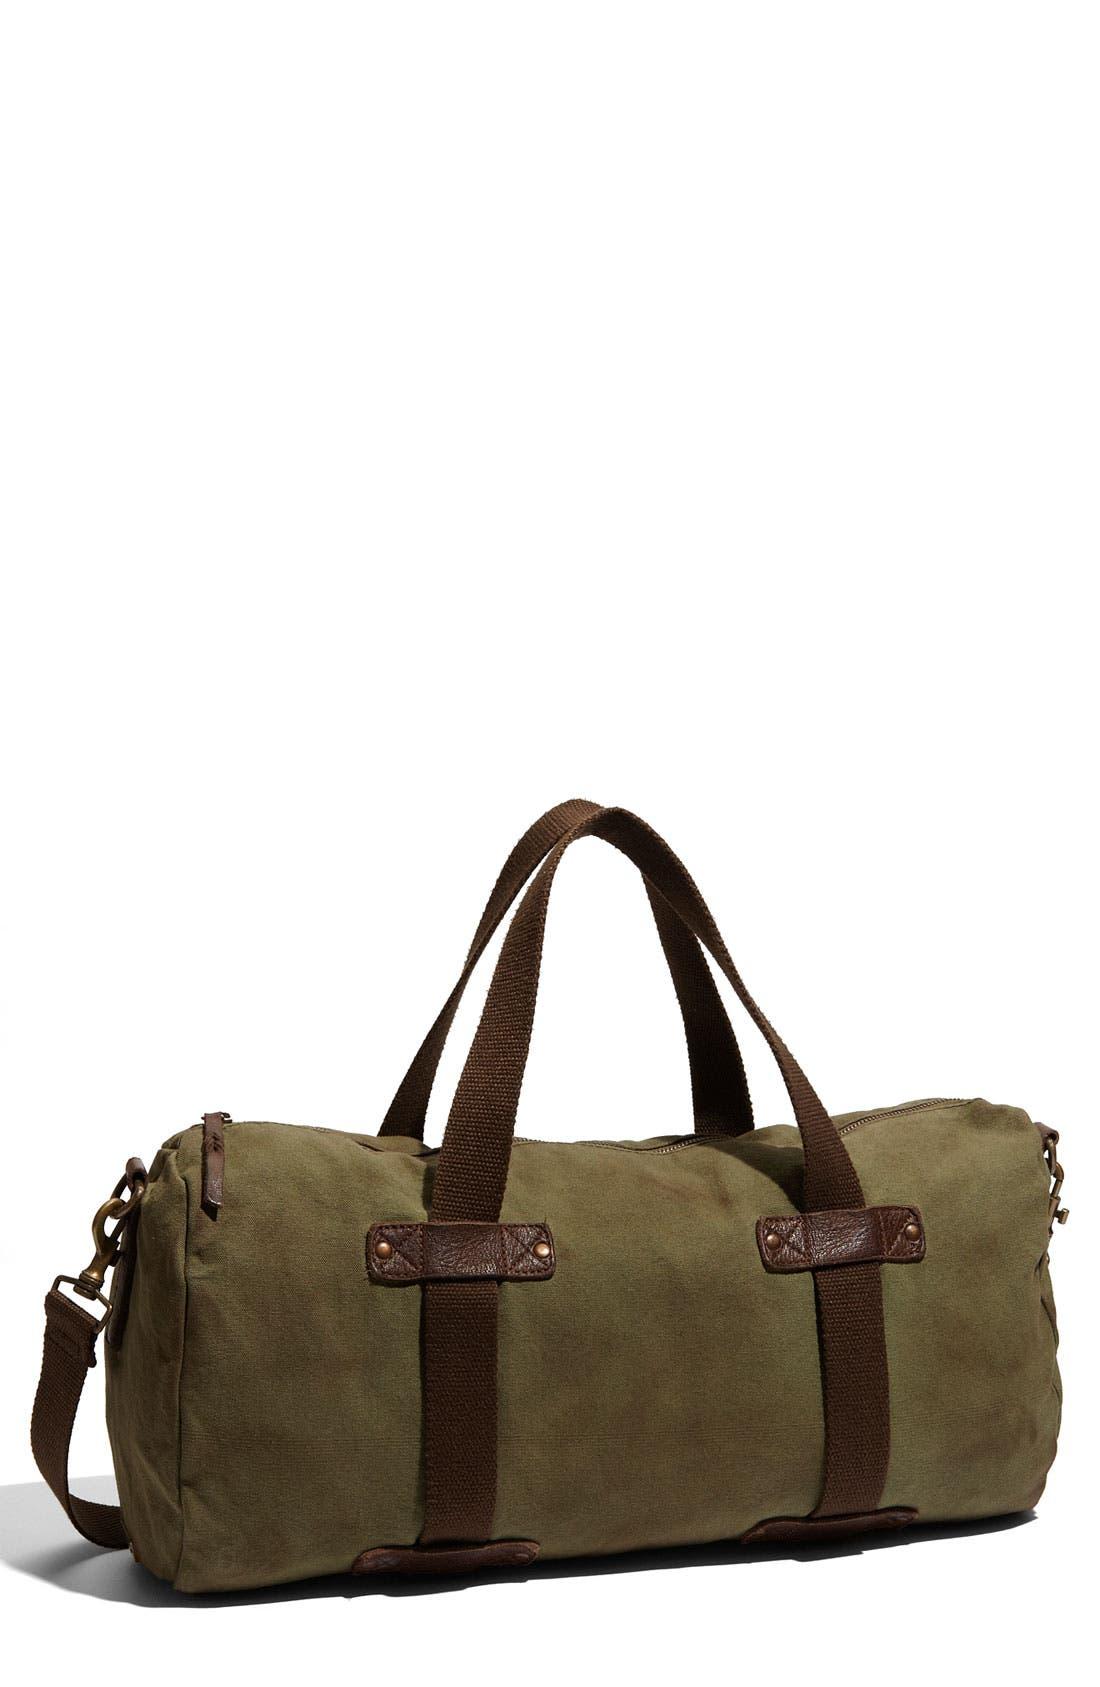 Basics Canvas Duffel Bag